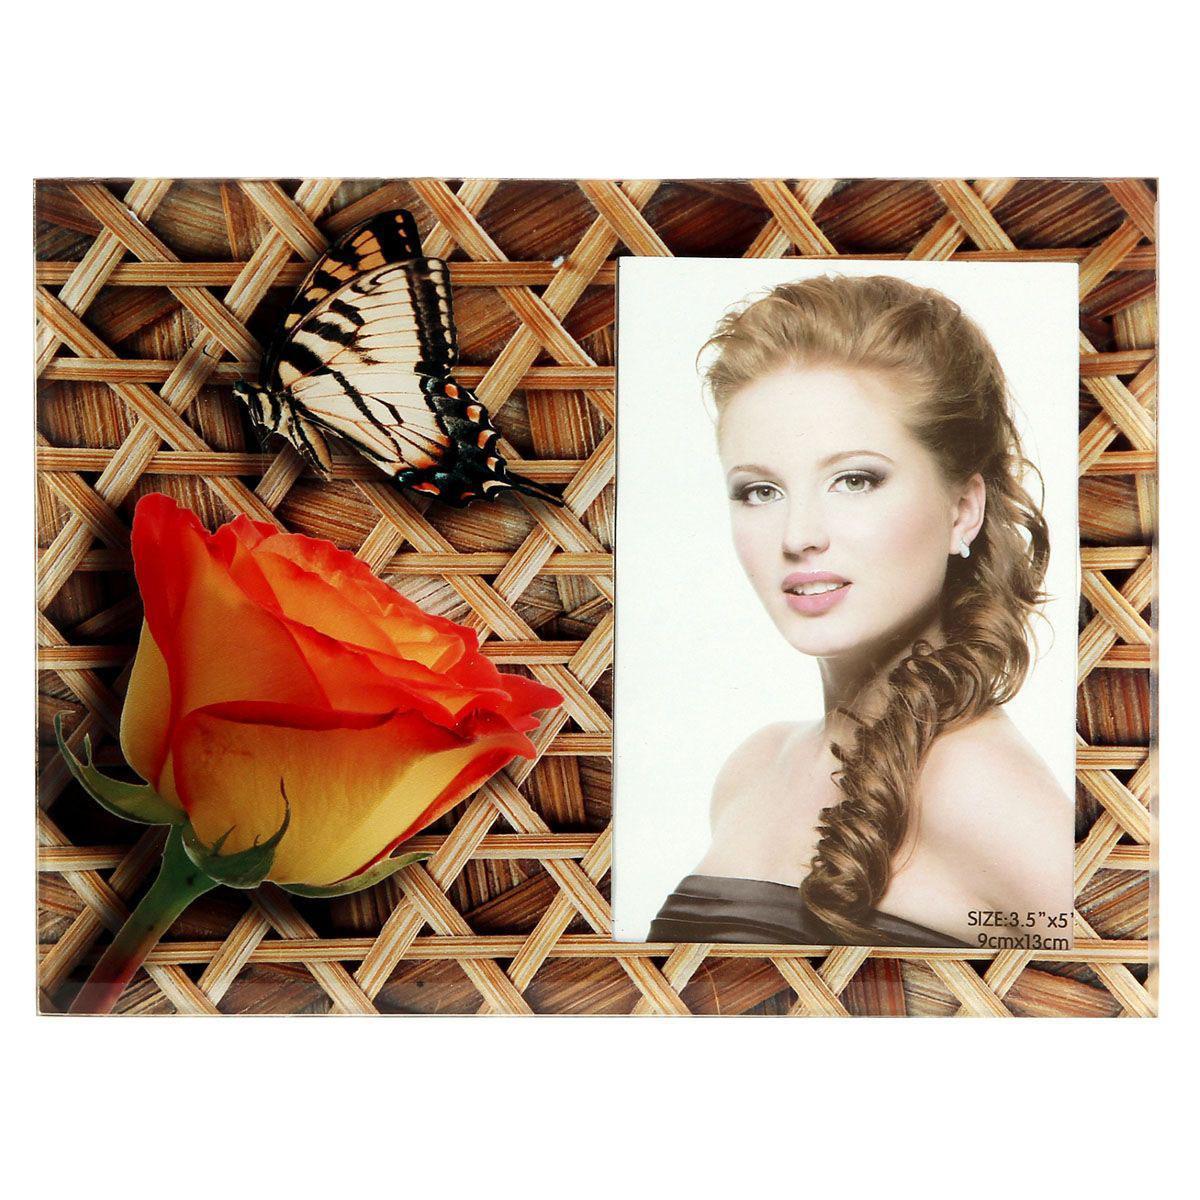 Фоторамка Sima-land Роза с бабочкой на плетенке, цвет: коричневый, 9 х 13 см фоторамка sima land леопард 9 х 13 см 803946